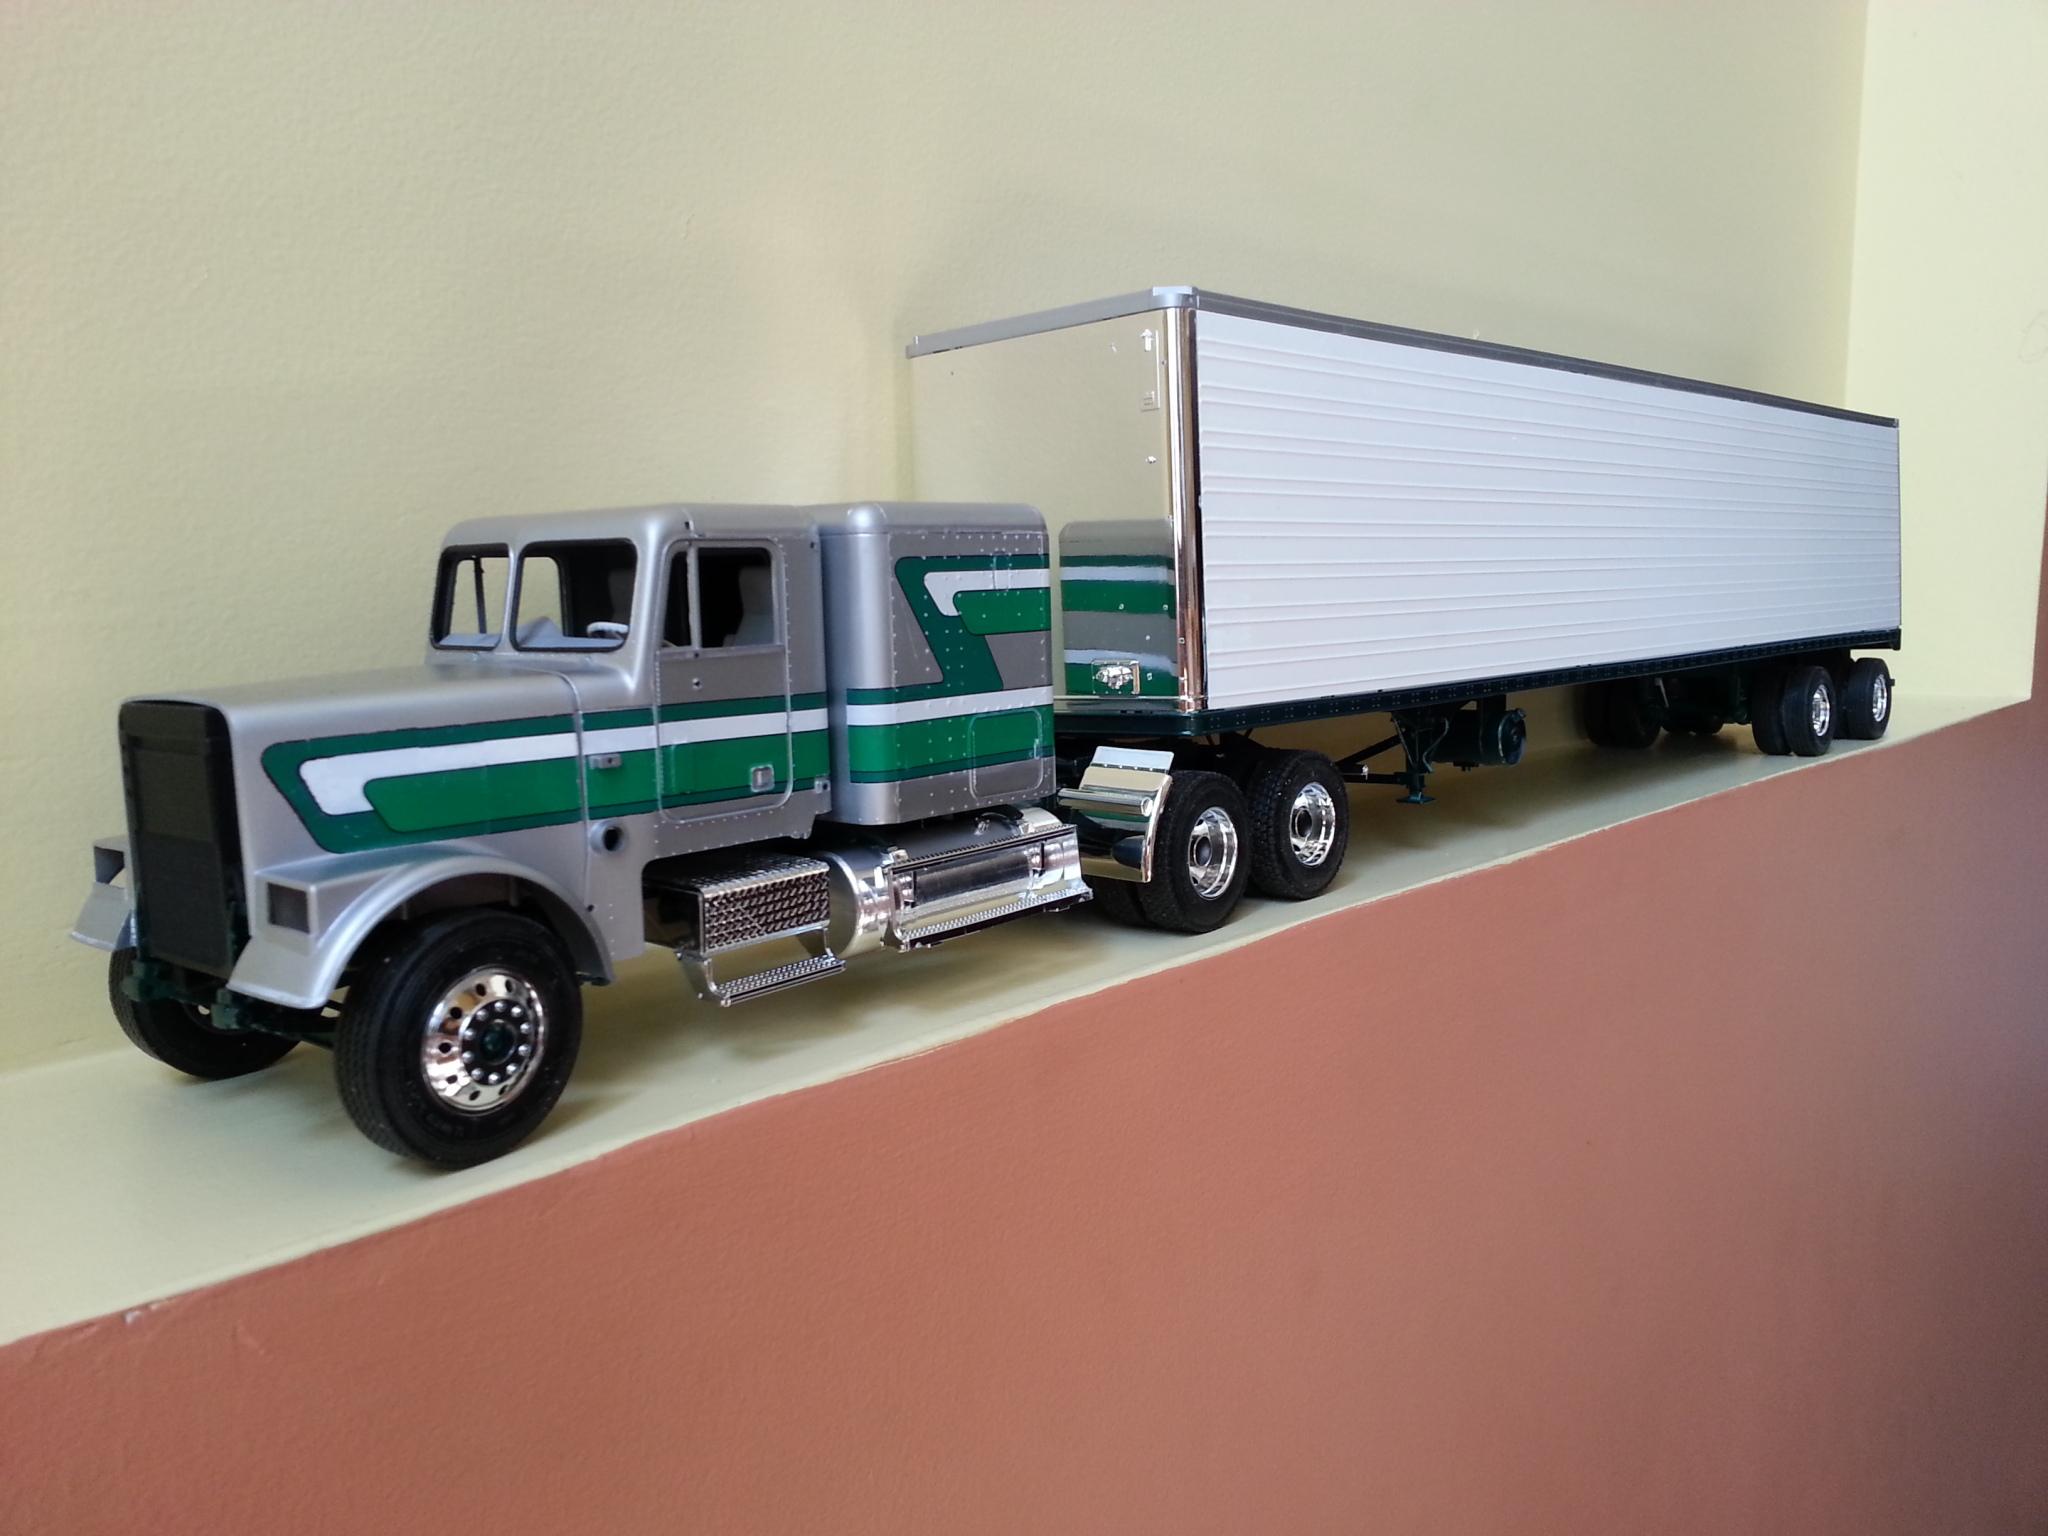 Freightliner FLC silver et vert 153w7sz